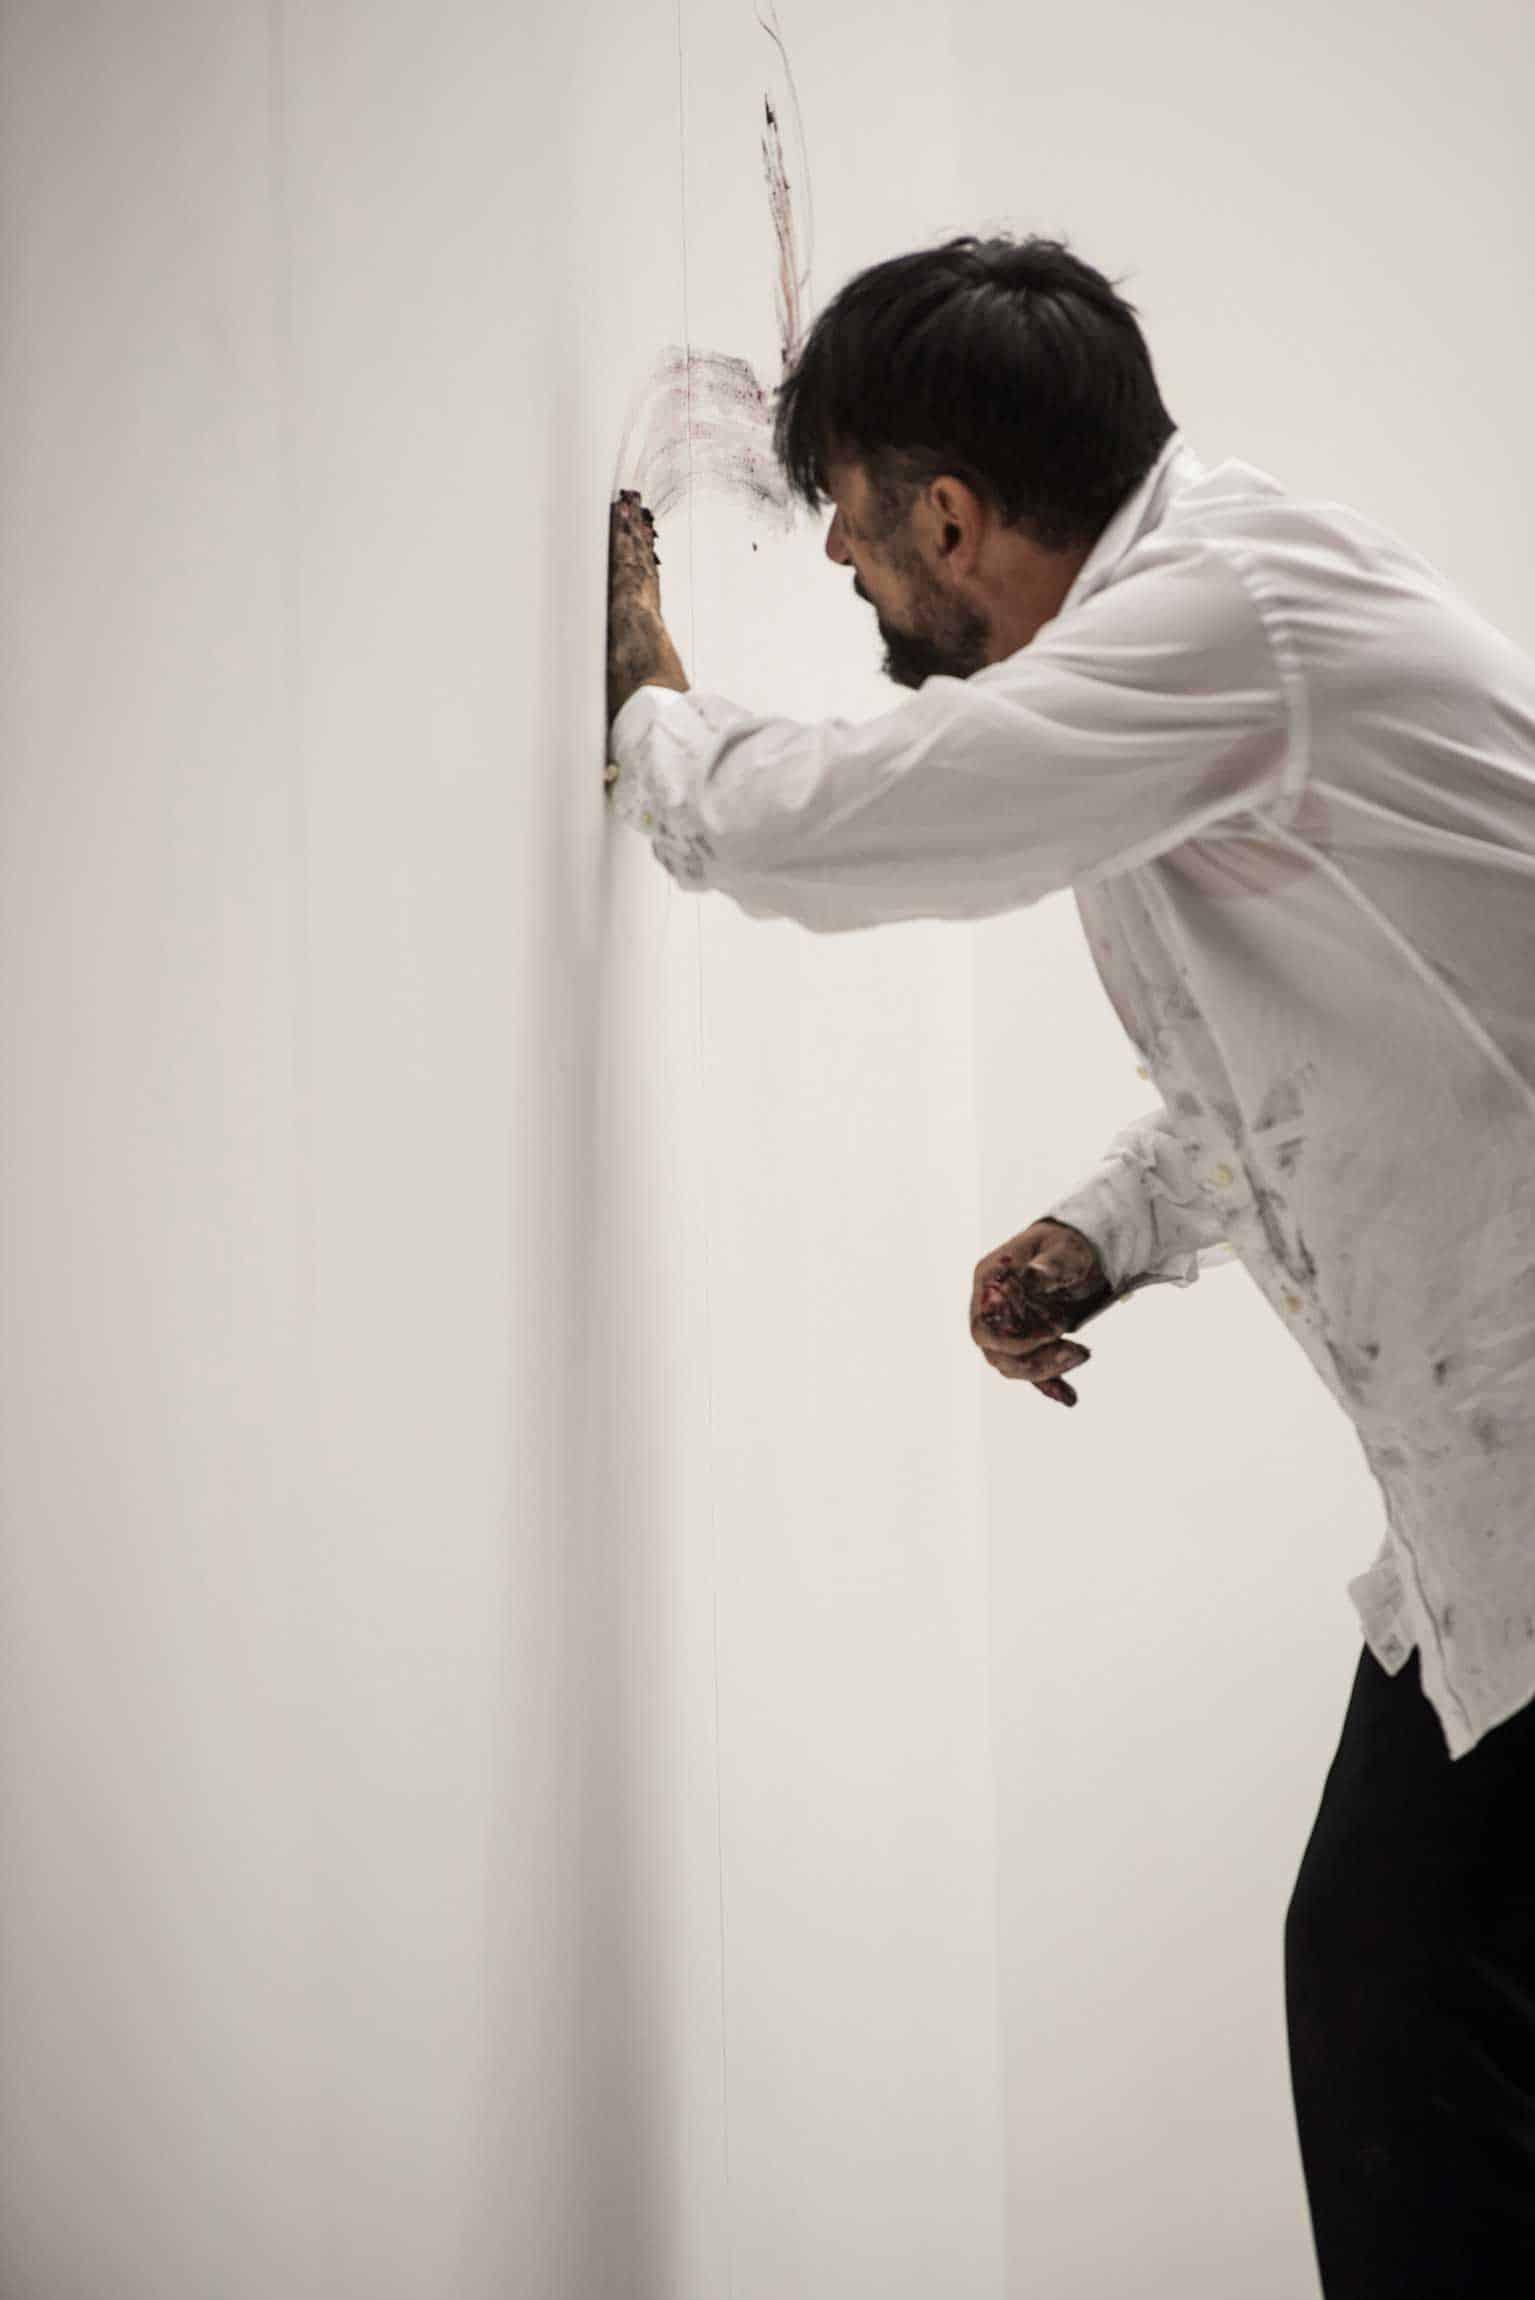 Ayad Akhtar, «Disgraced», regia di Martin Kušej, 2017. Teatro Carignano di Torino. Paolo Pierobon.